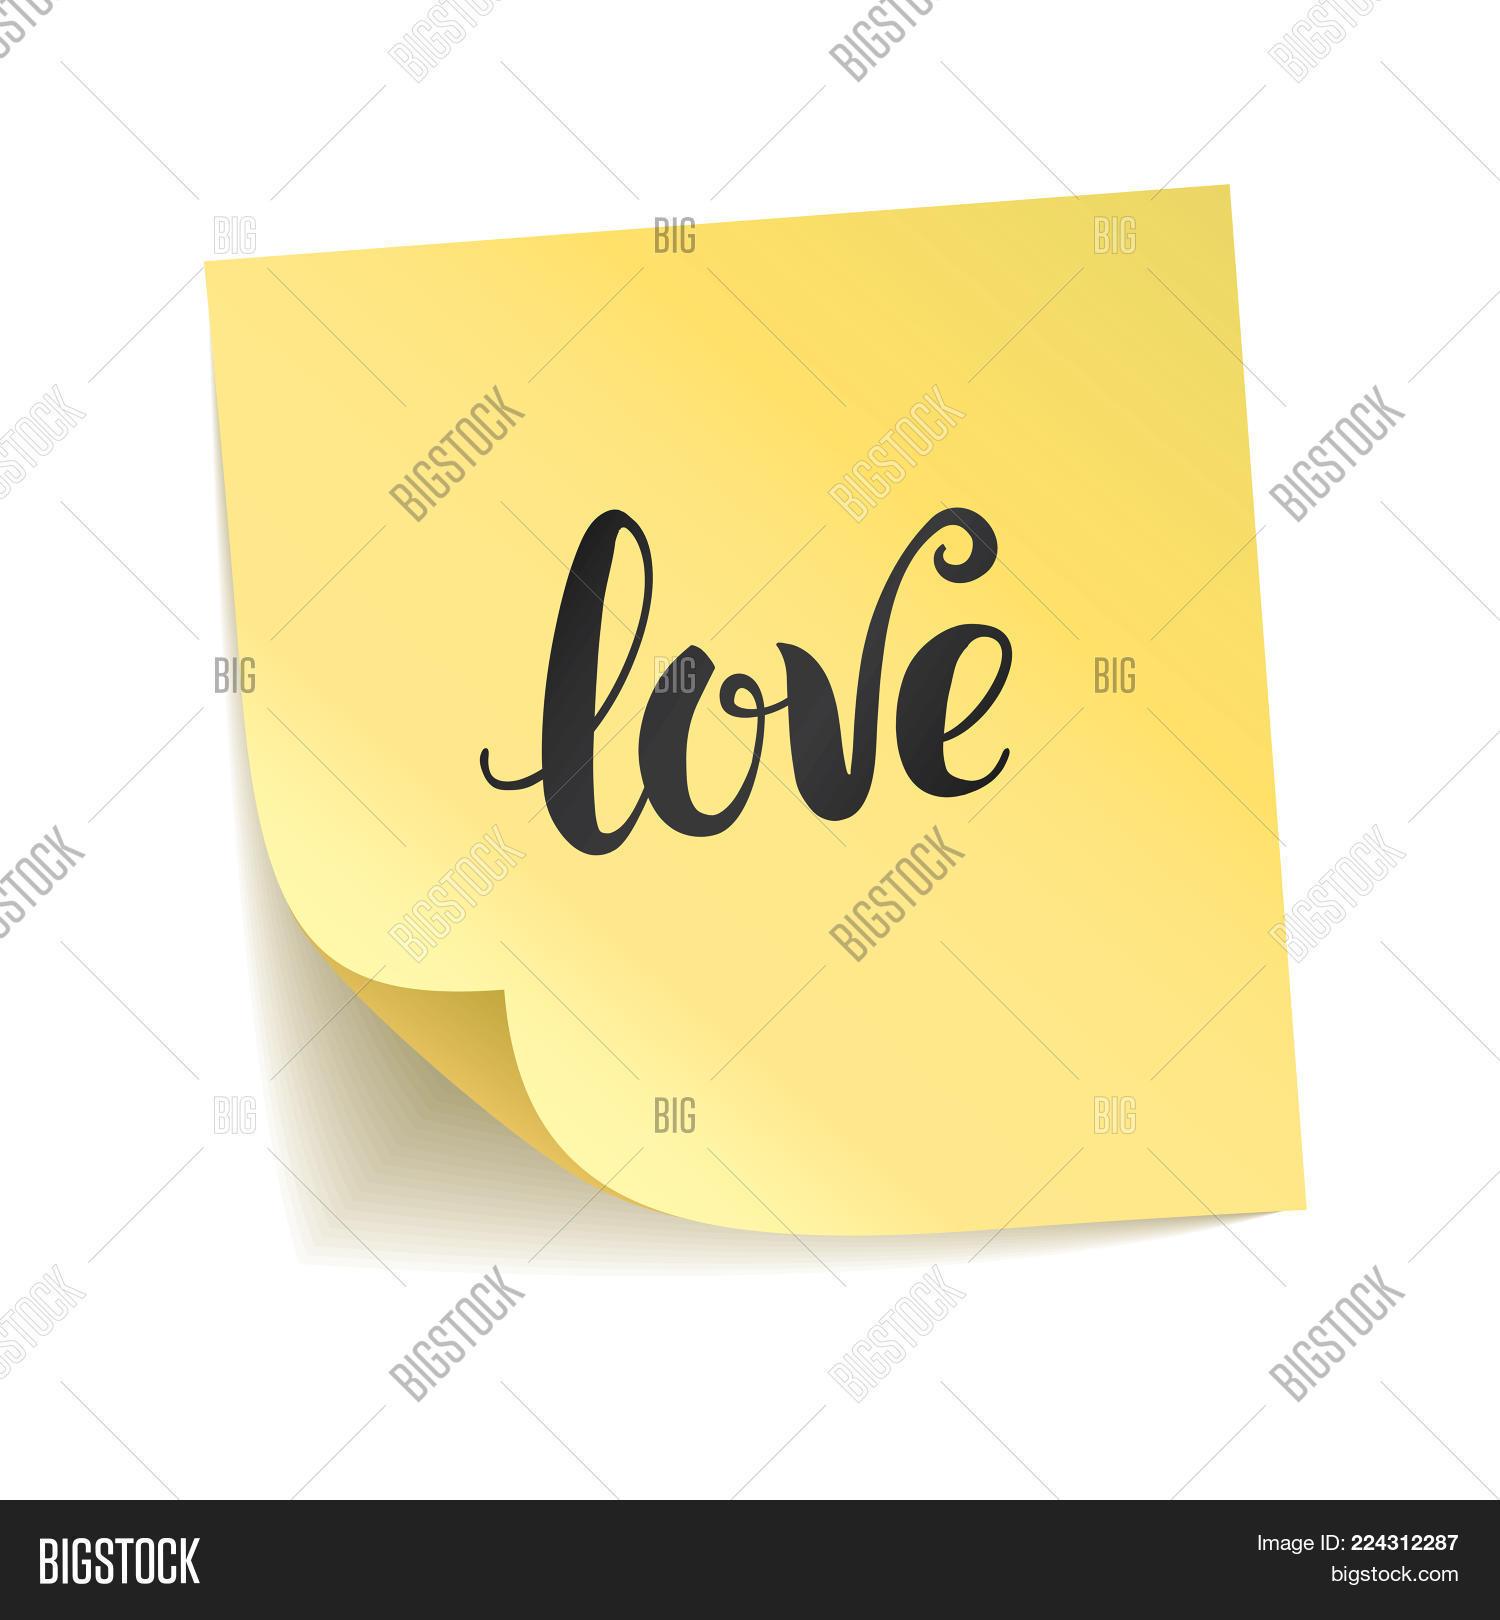 Note Yellow Sticker Image Photo Free Trial Bigstock